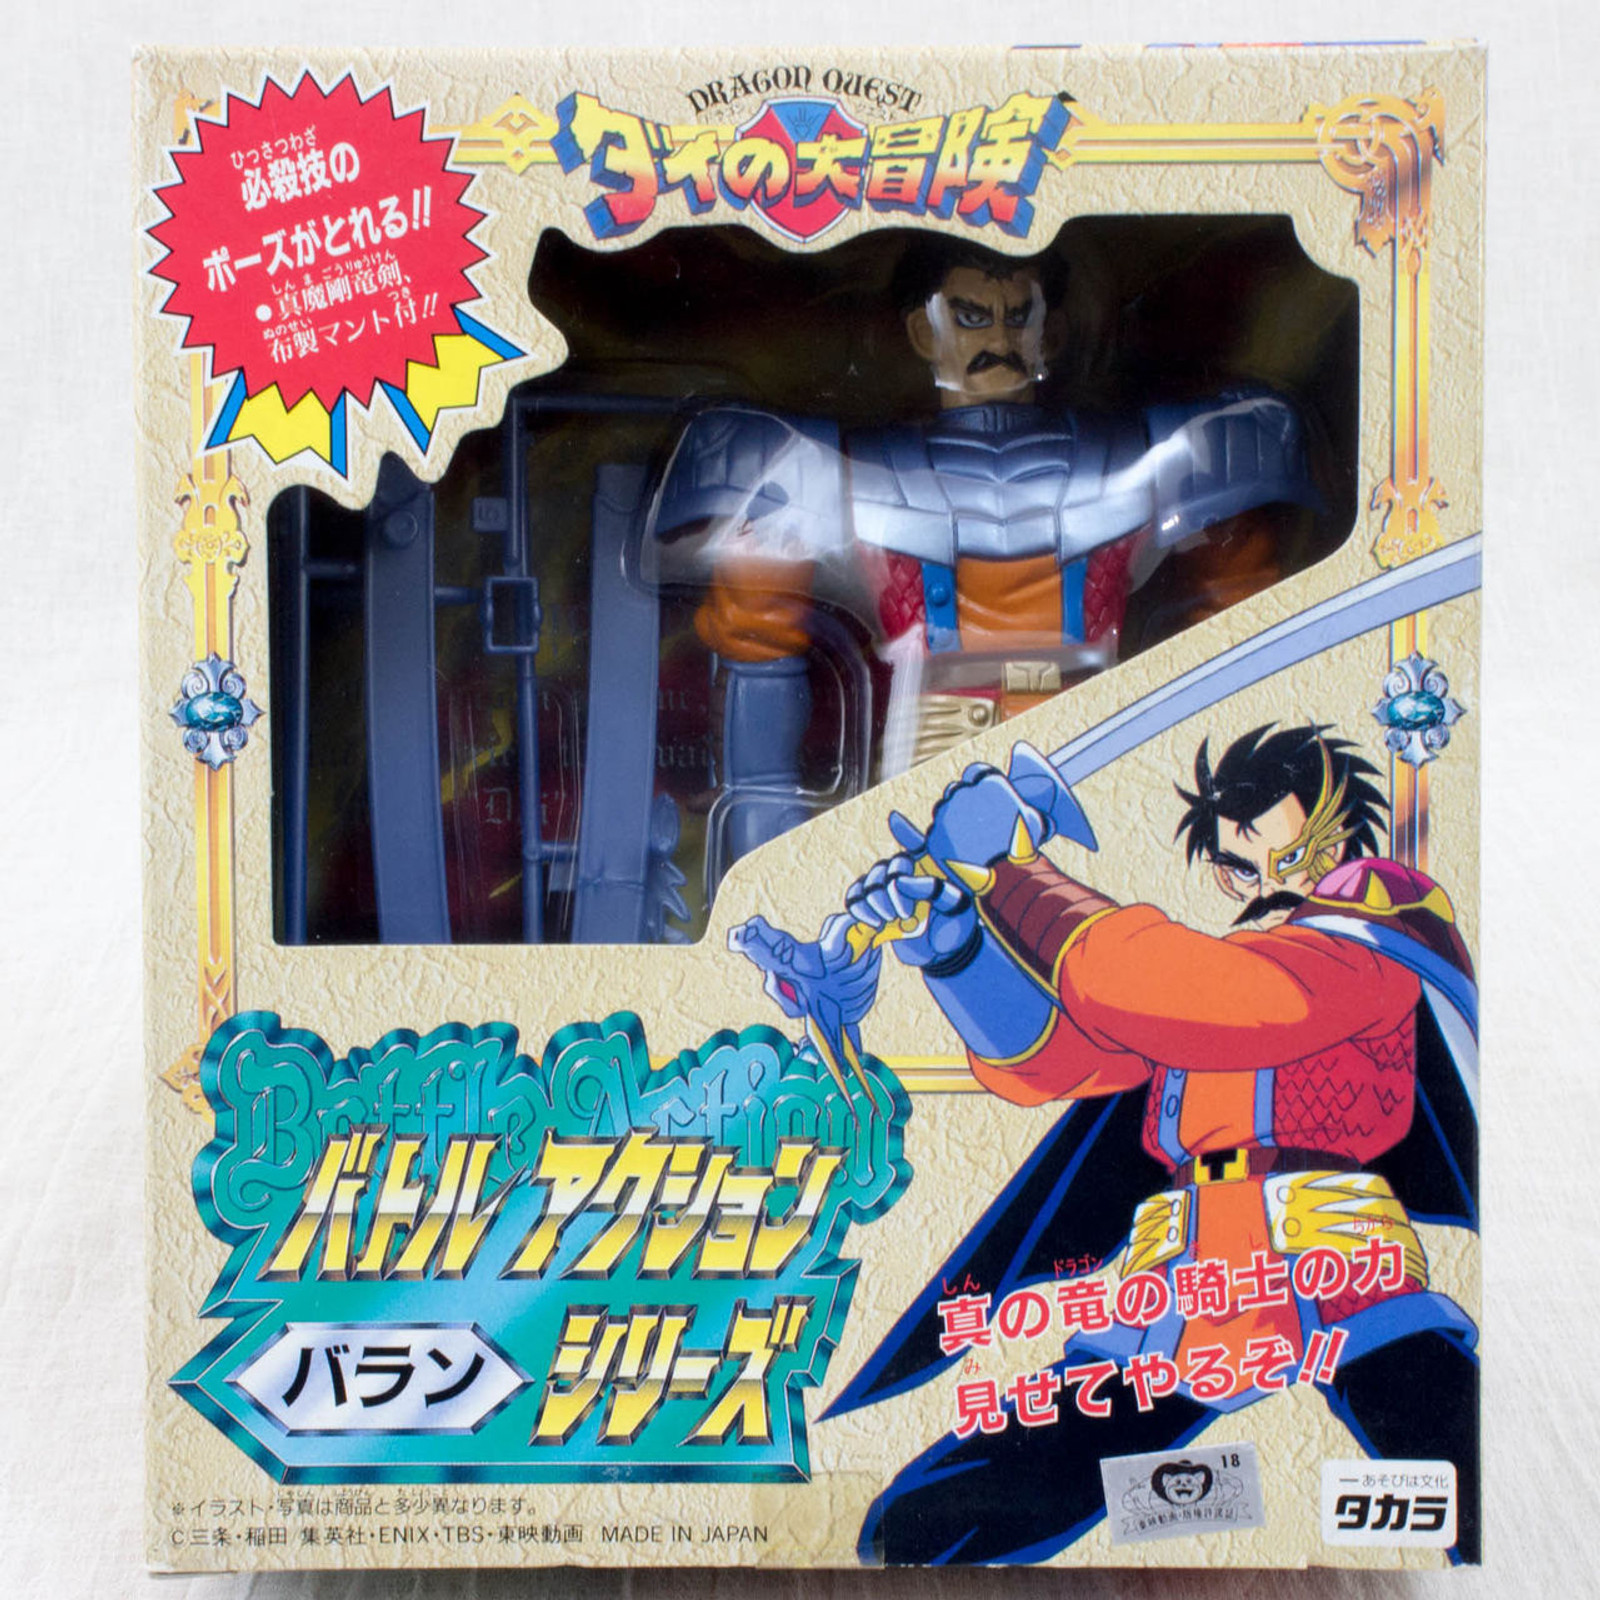 RARE! Dragon Quest: The Adventure of Dai BARAN Figure Battle Action TAKARA JAPAN